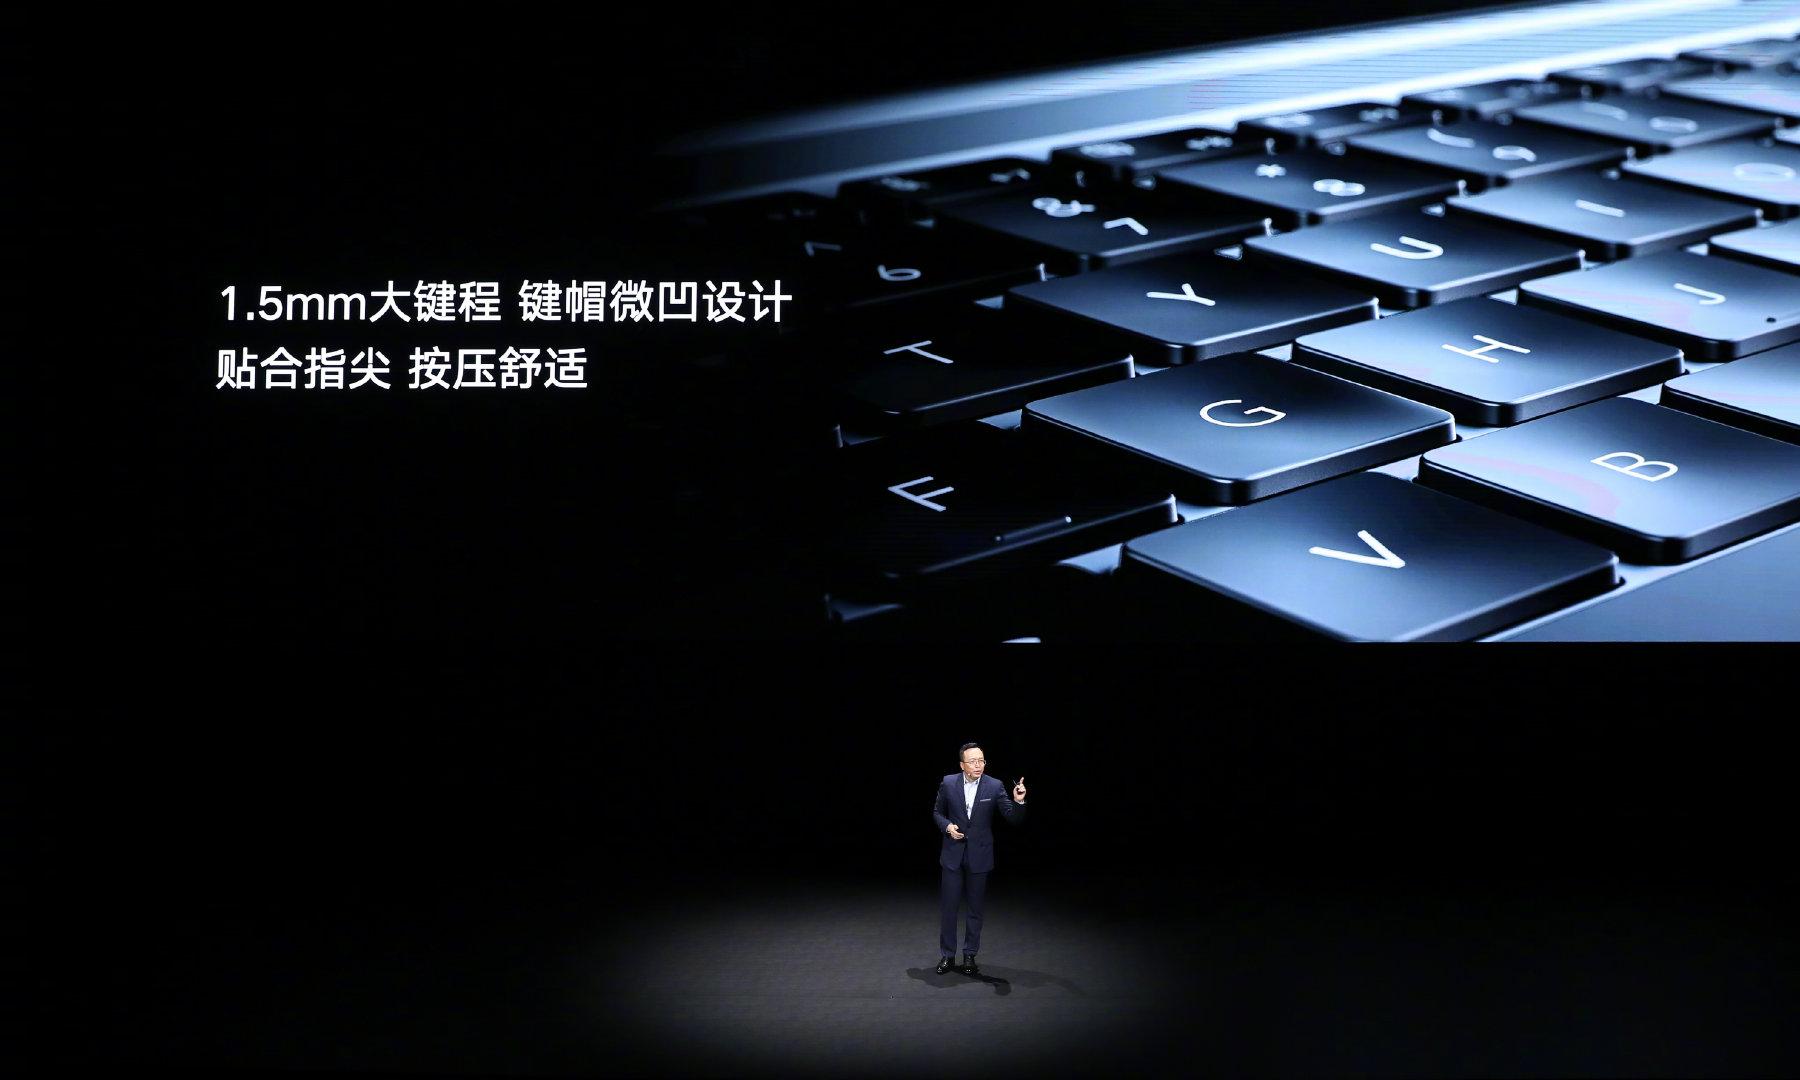 Evo认证+首发Windows11 荣耀旗舰笔记本MagicBook V 14发布